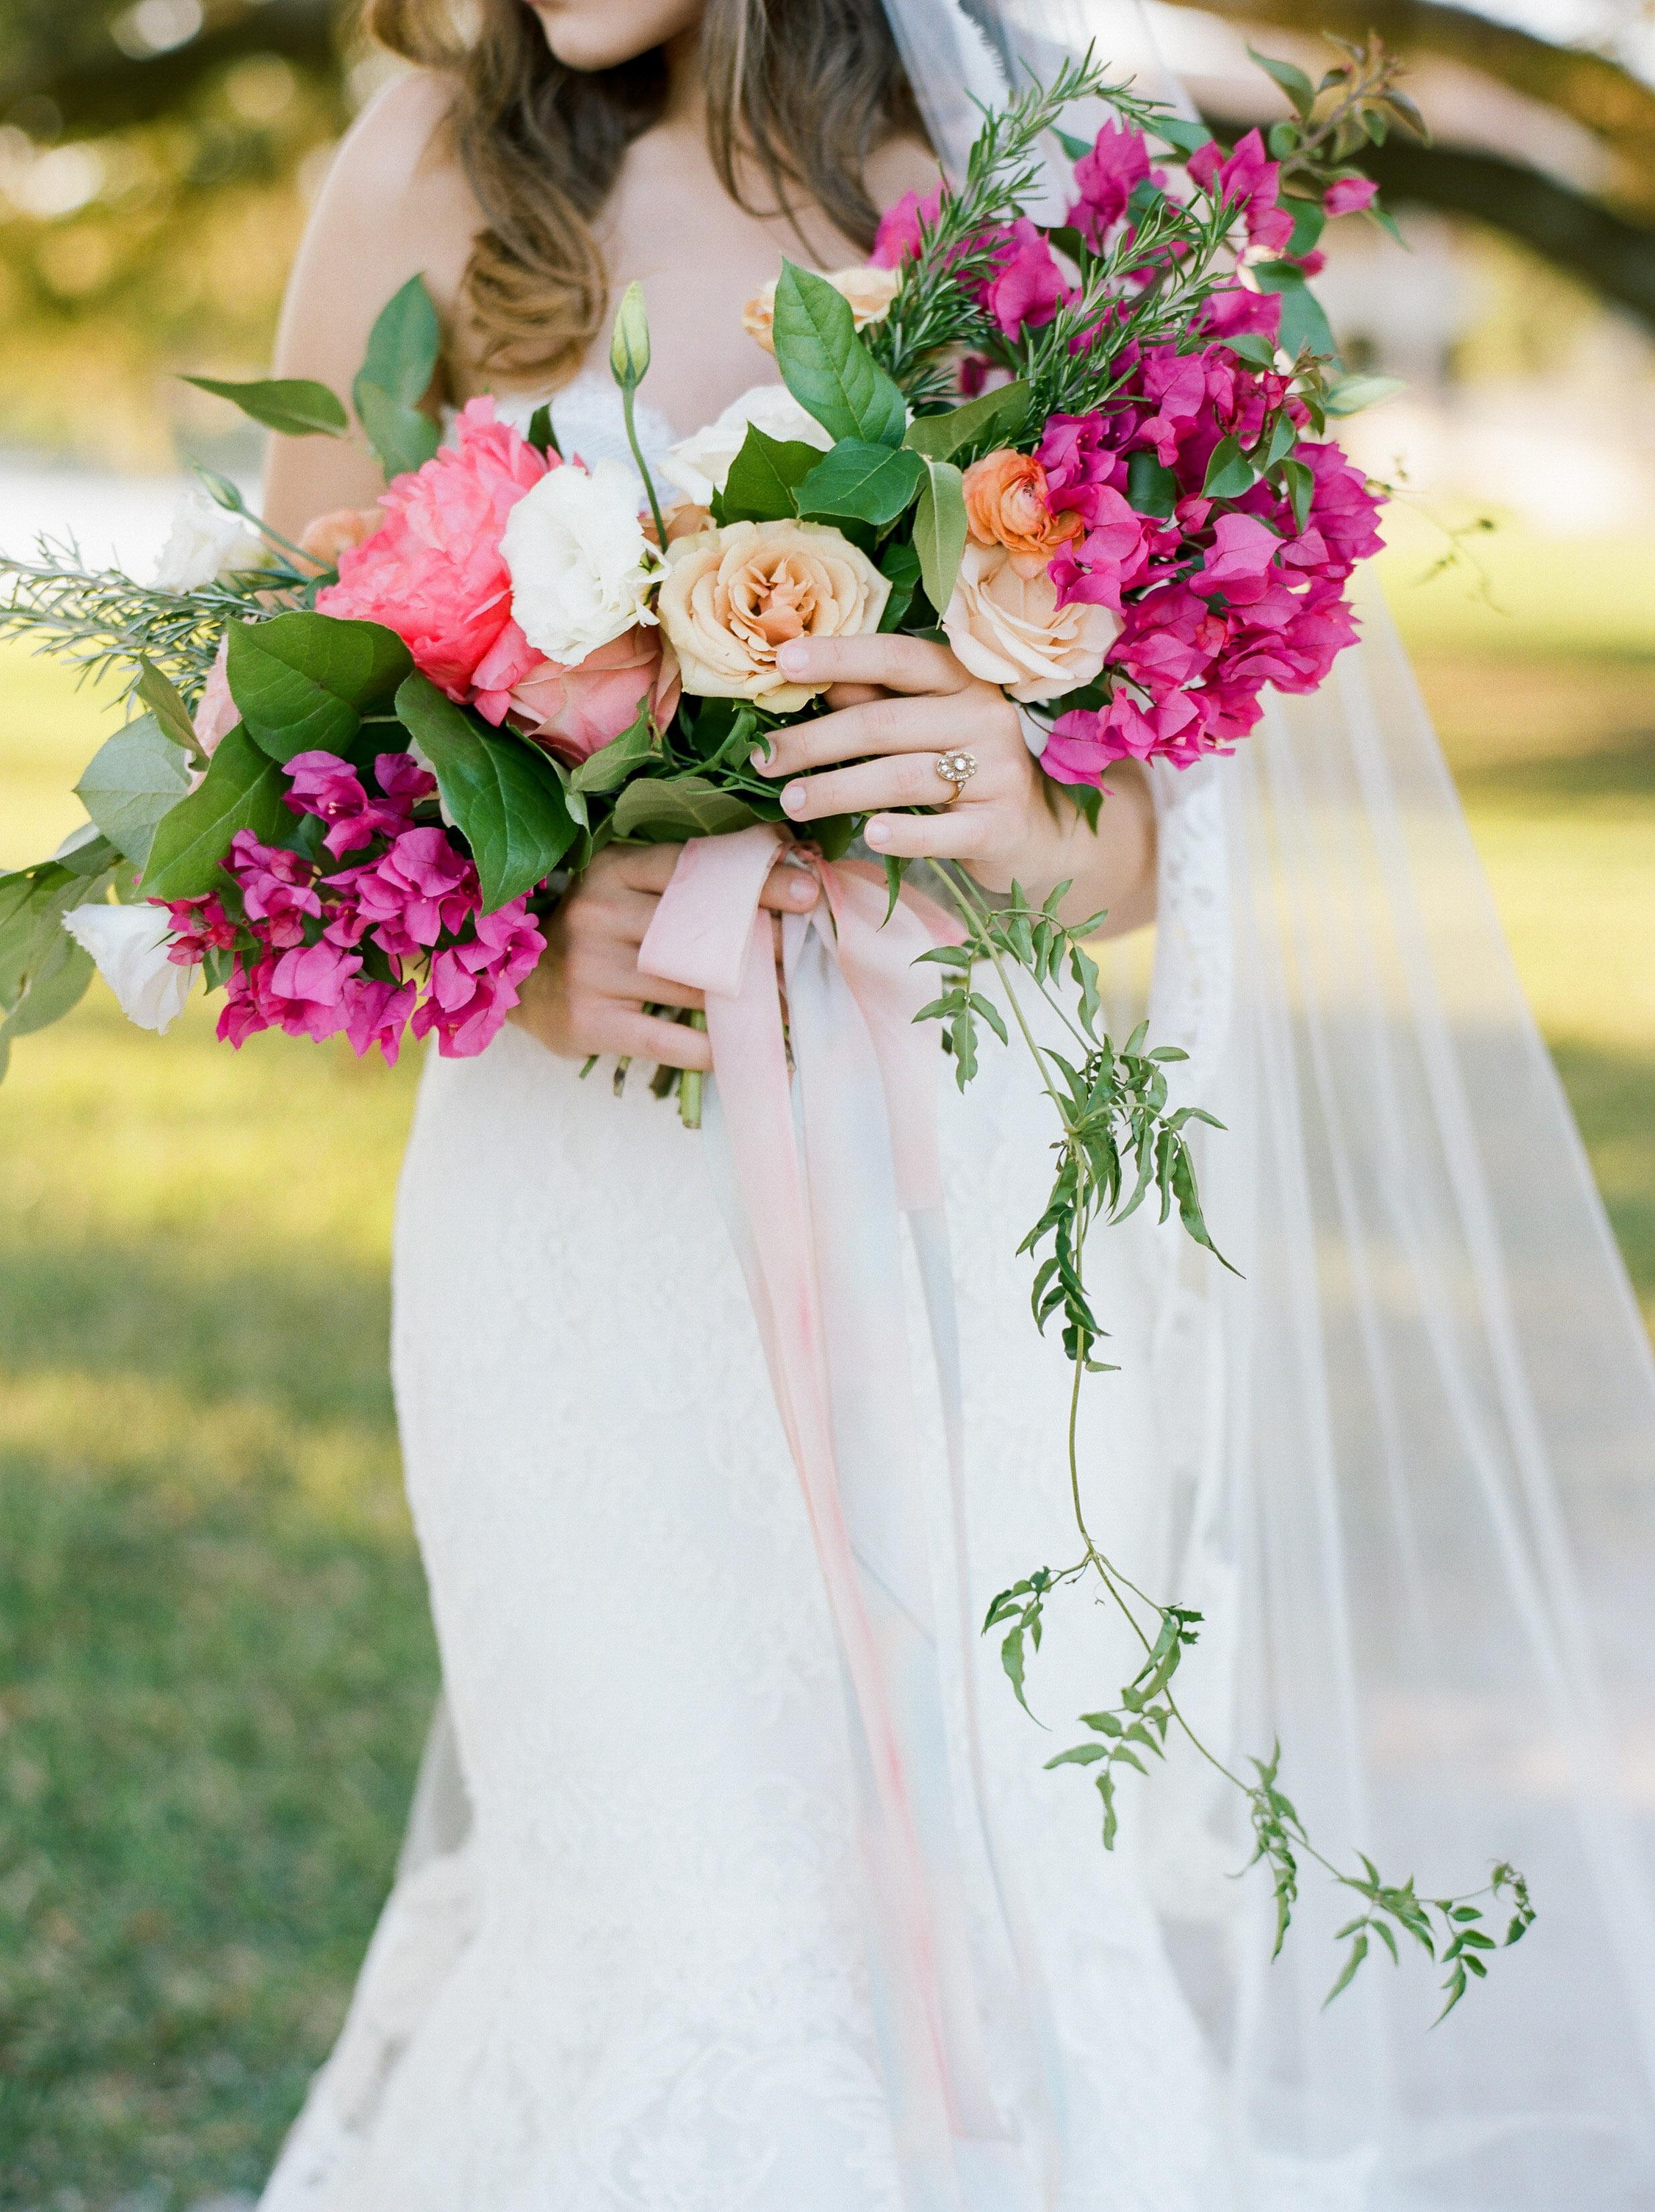 Top-Houston-Wedding-Photographer-Dana-Fernandez-Photography-The-Clubs-At-Houston-Oaks-Country-Club-Belle-Events-Film-Fine-Art-Destination-4.jpg